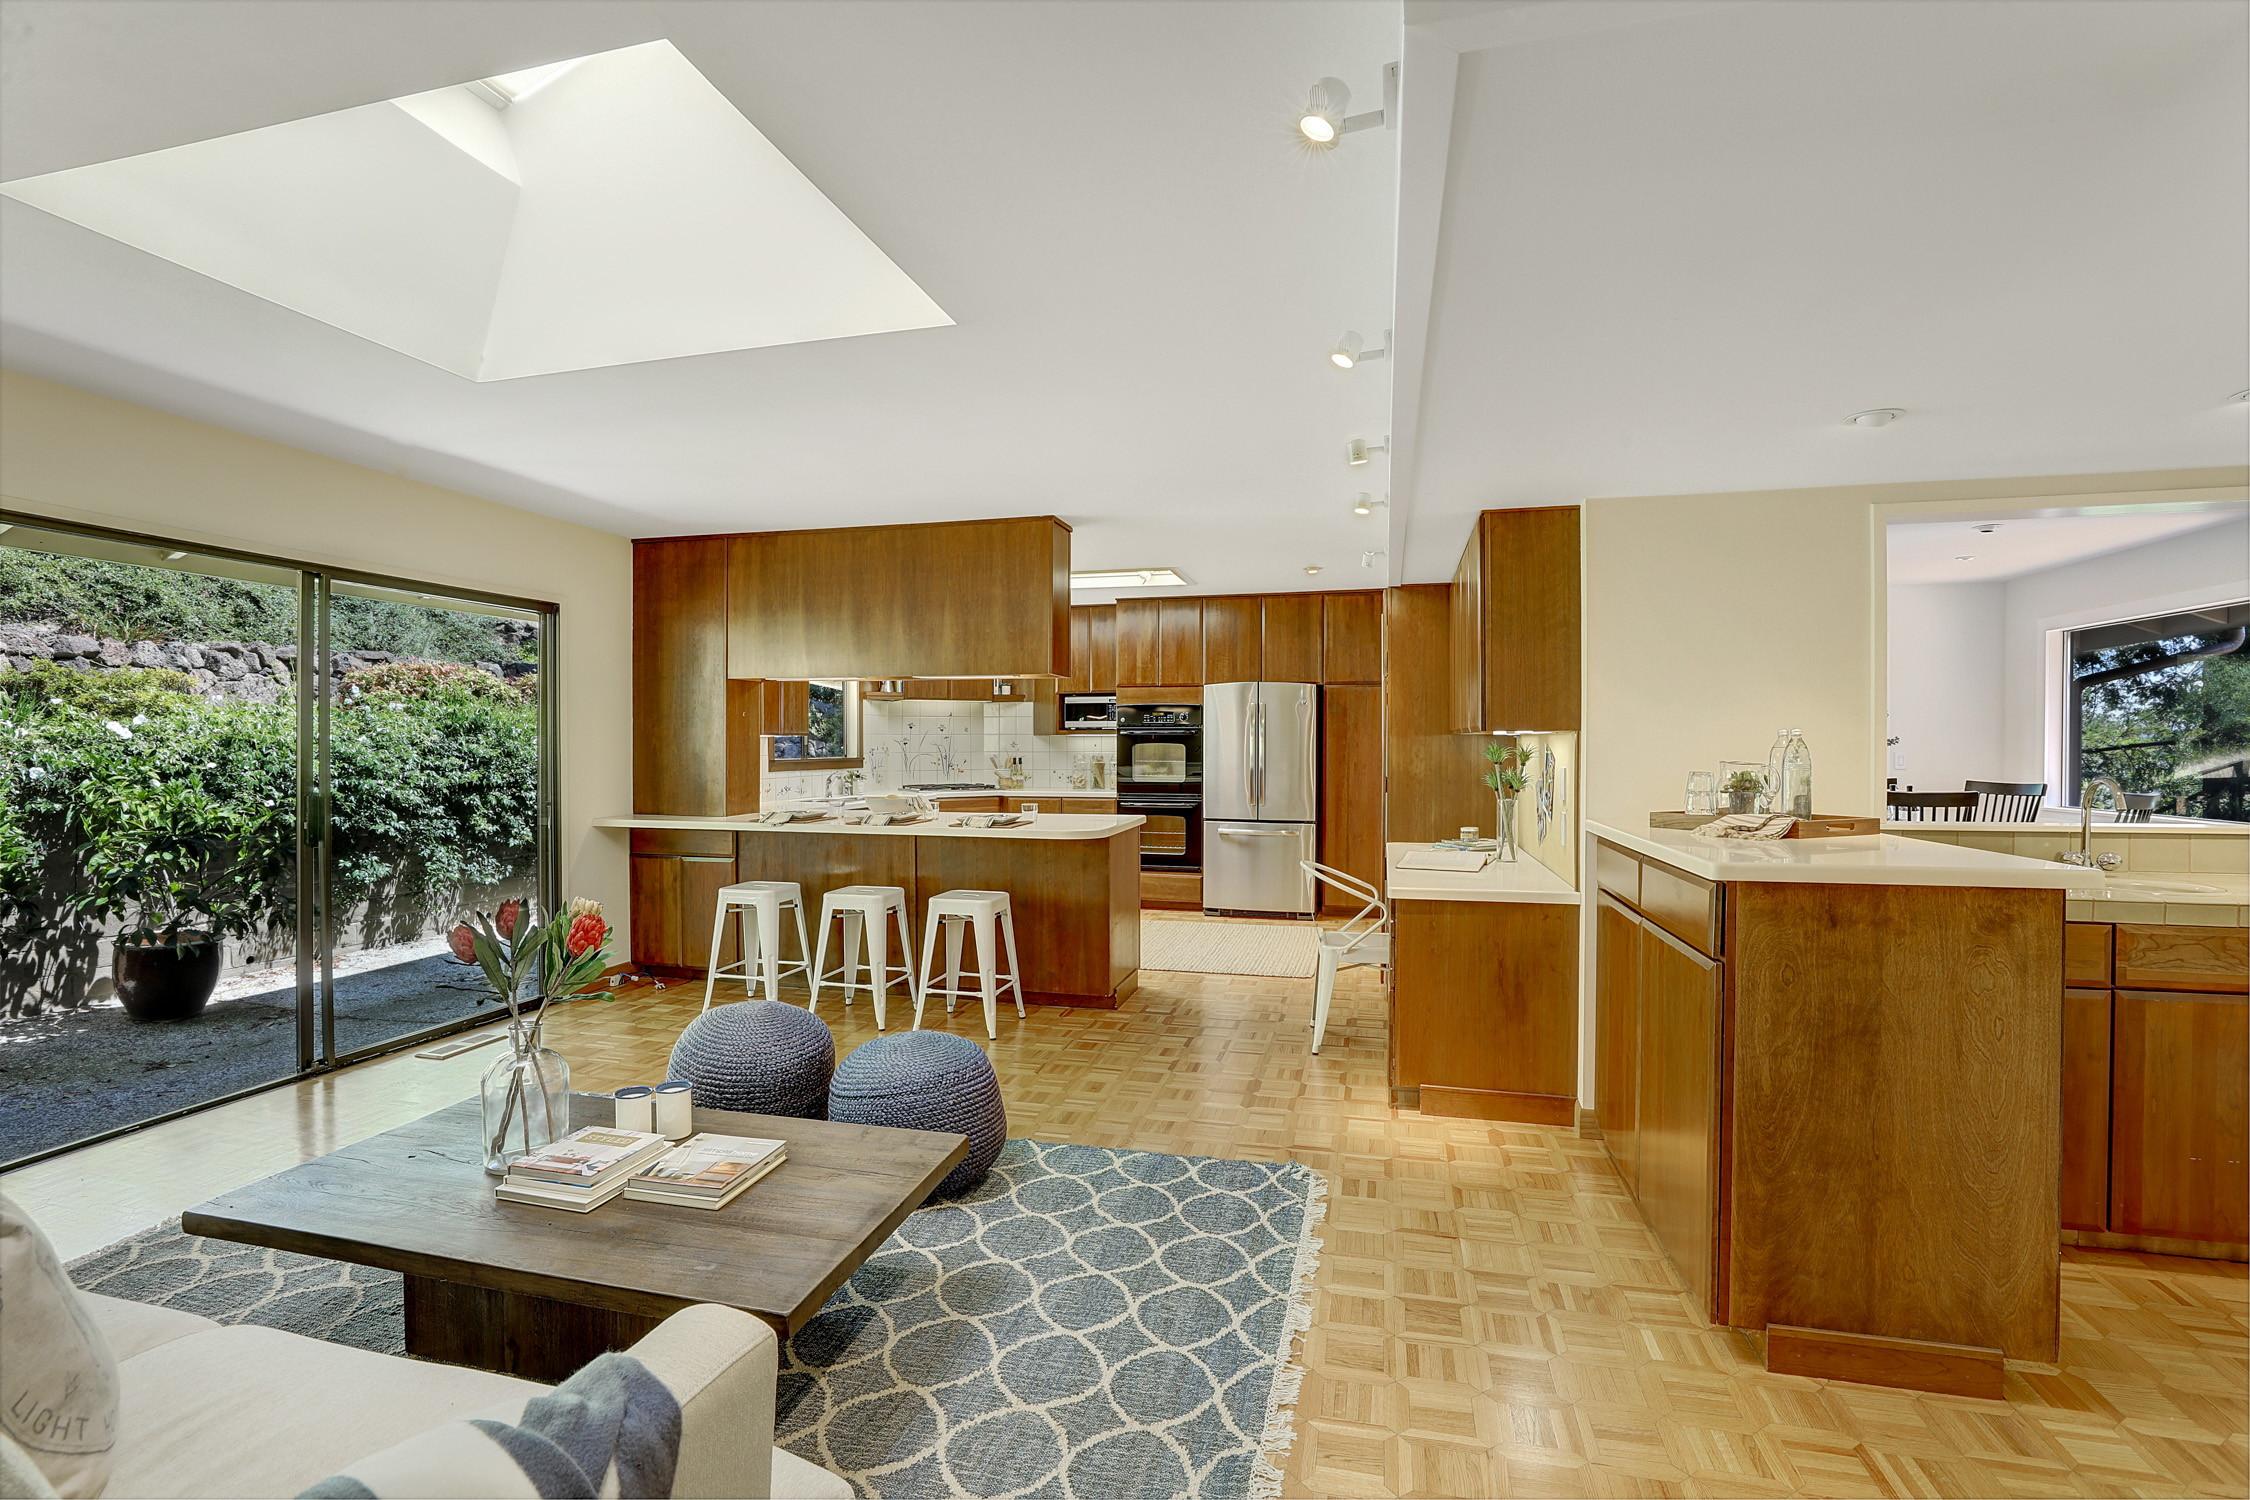 16Dorian 15 MLSSan Rafael Real Estate - Listed by Julia Fitzpatrick + Allie Fornesi Team Own Marin County .jpg